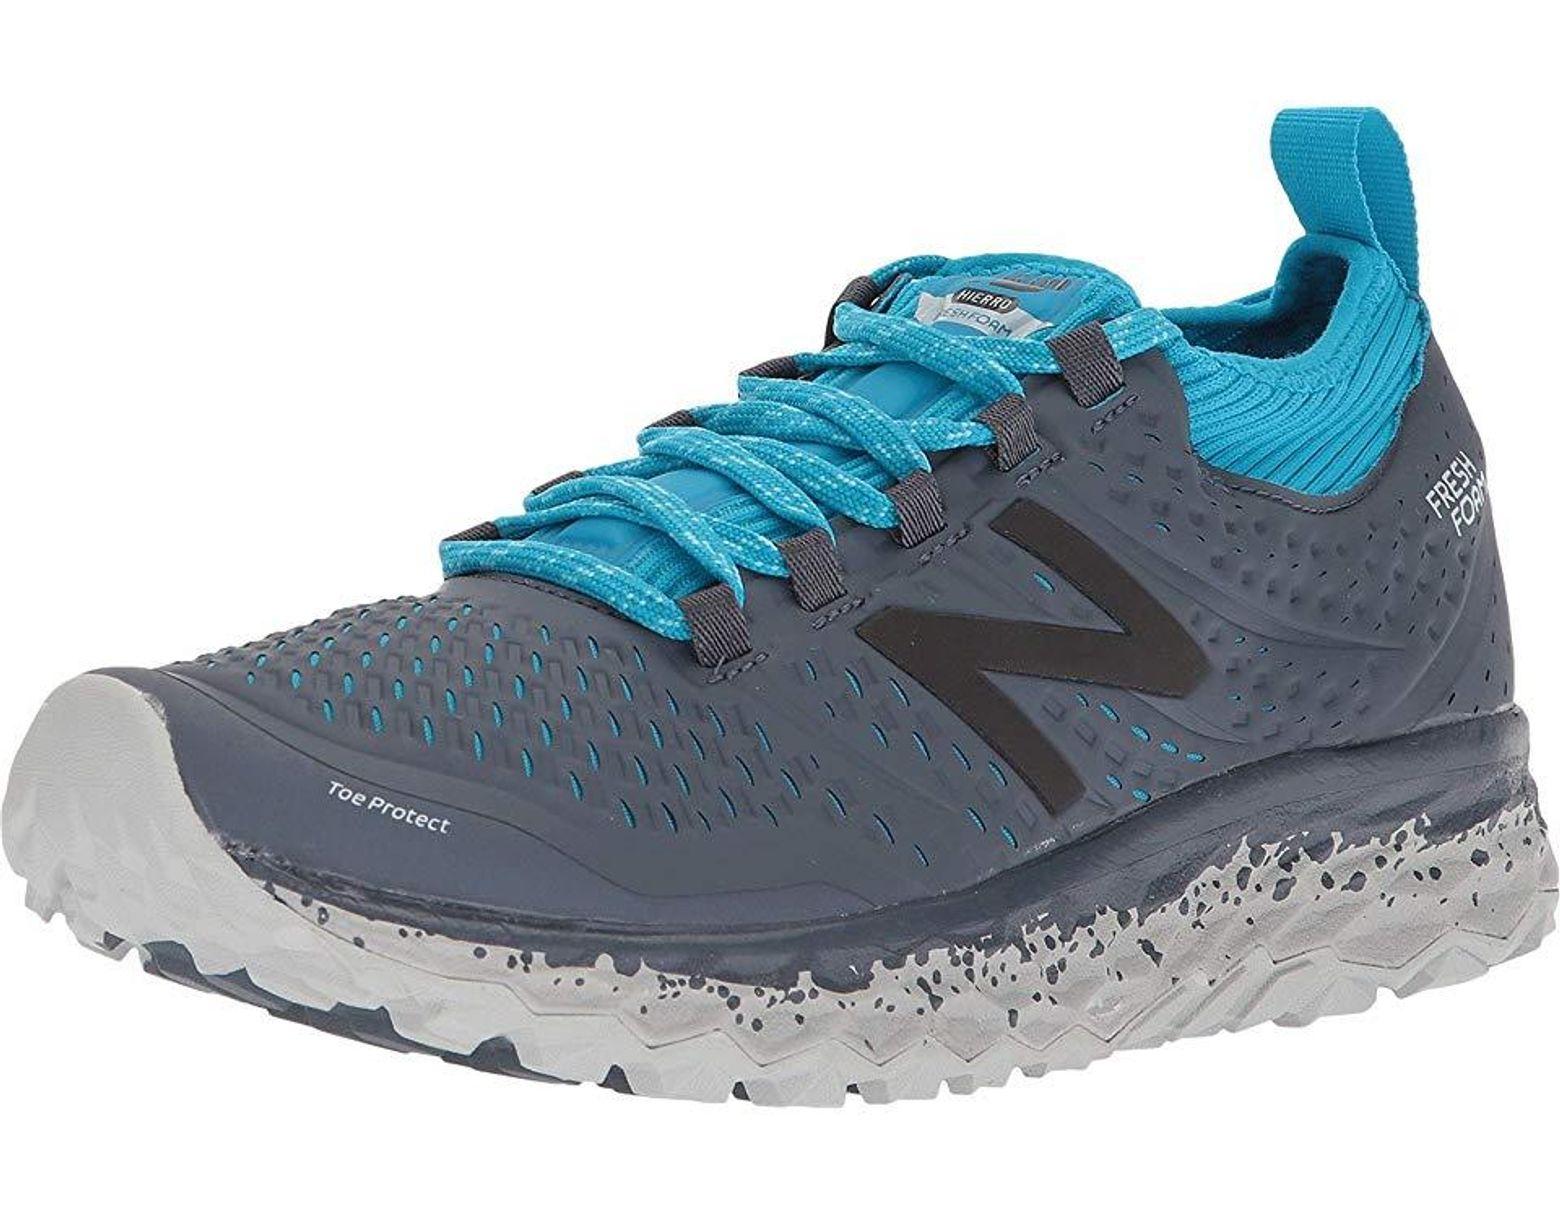 f3b1744f5b49b New Balance Fresh Foam Hierro V3 (thunder/maldives Blue) Running Shoes in  Blue - Save 74% - Lyst